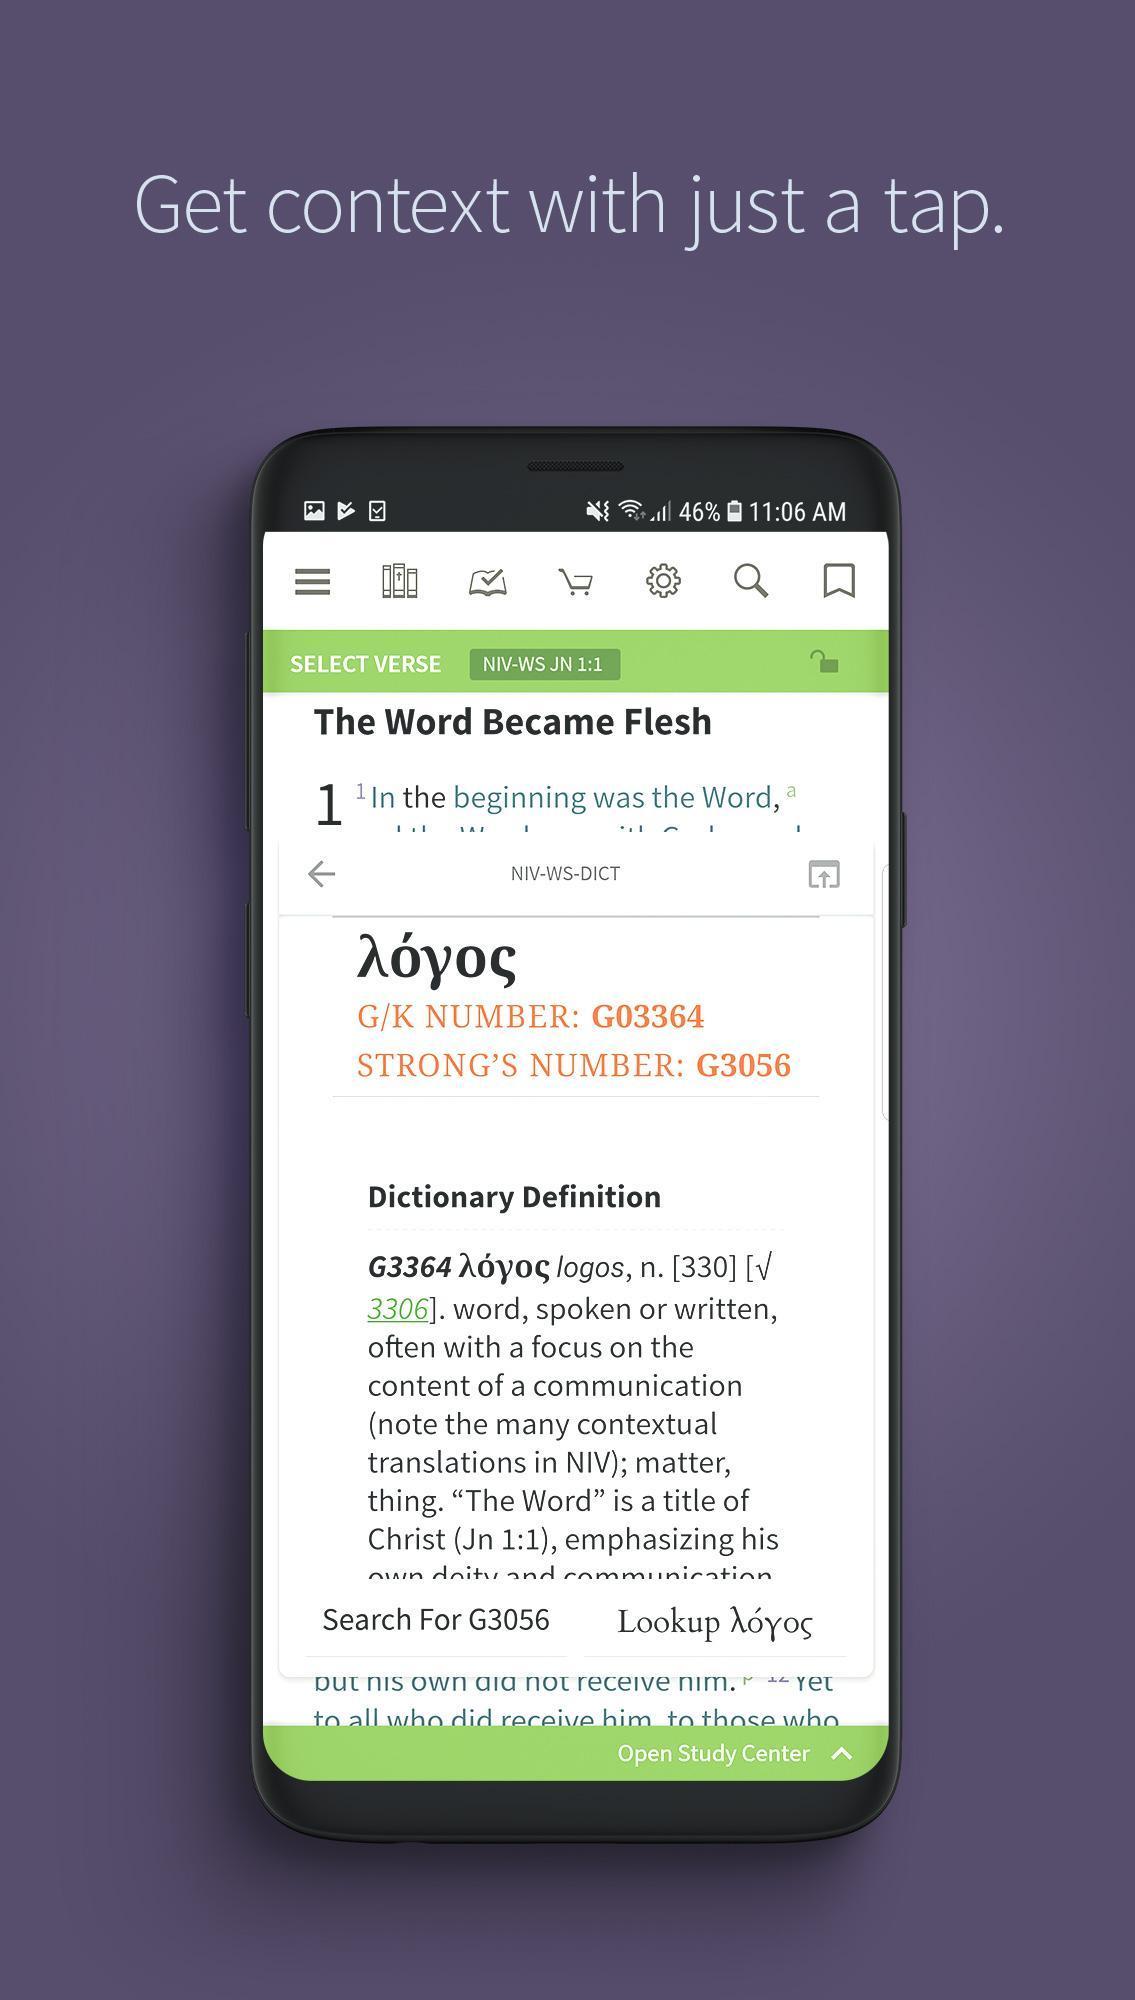 Bible App by Olive Tree 7.5.4.0.5664 Screenshot 8